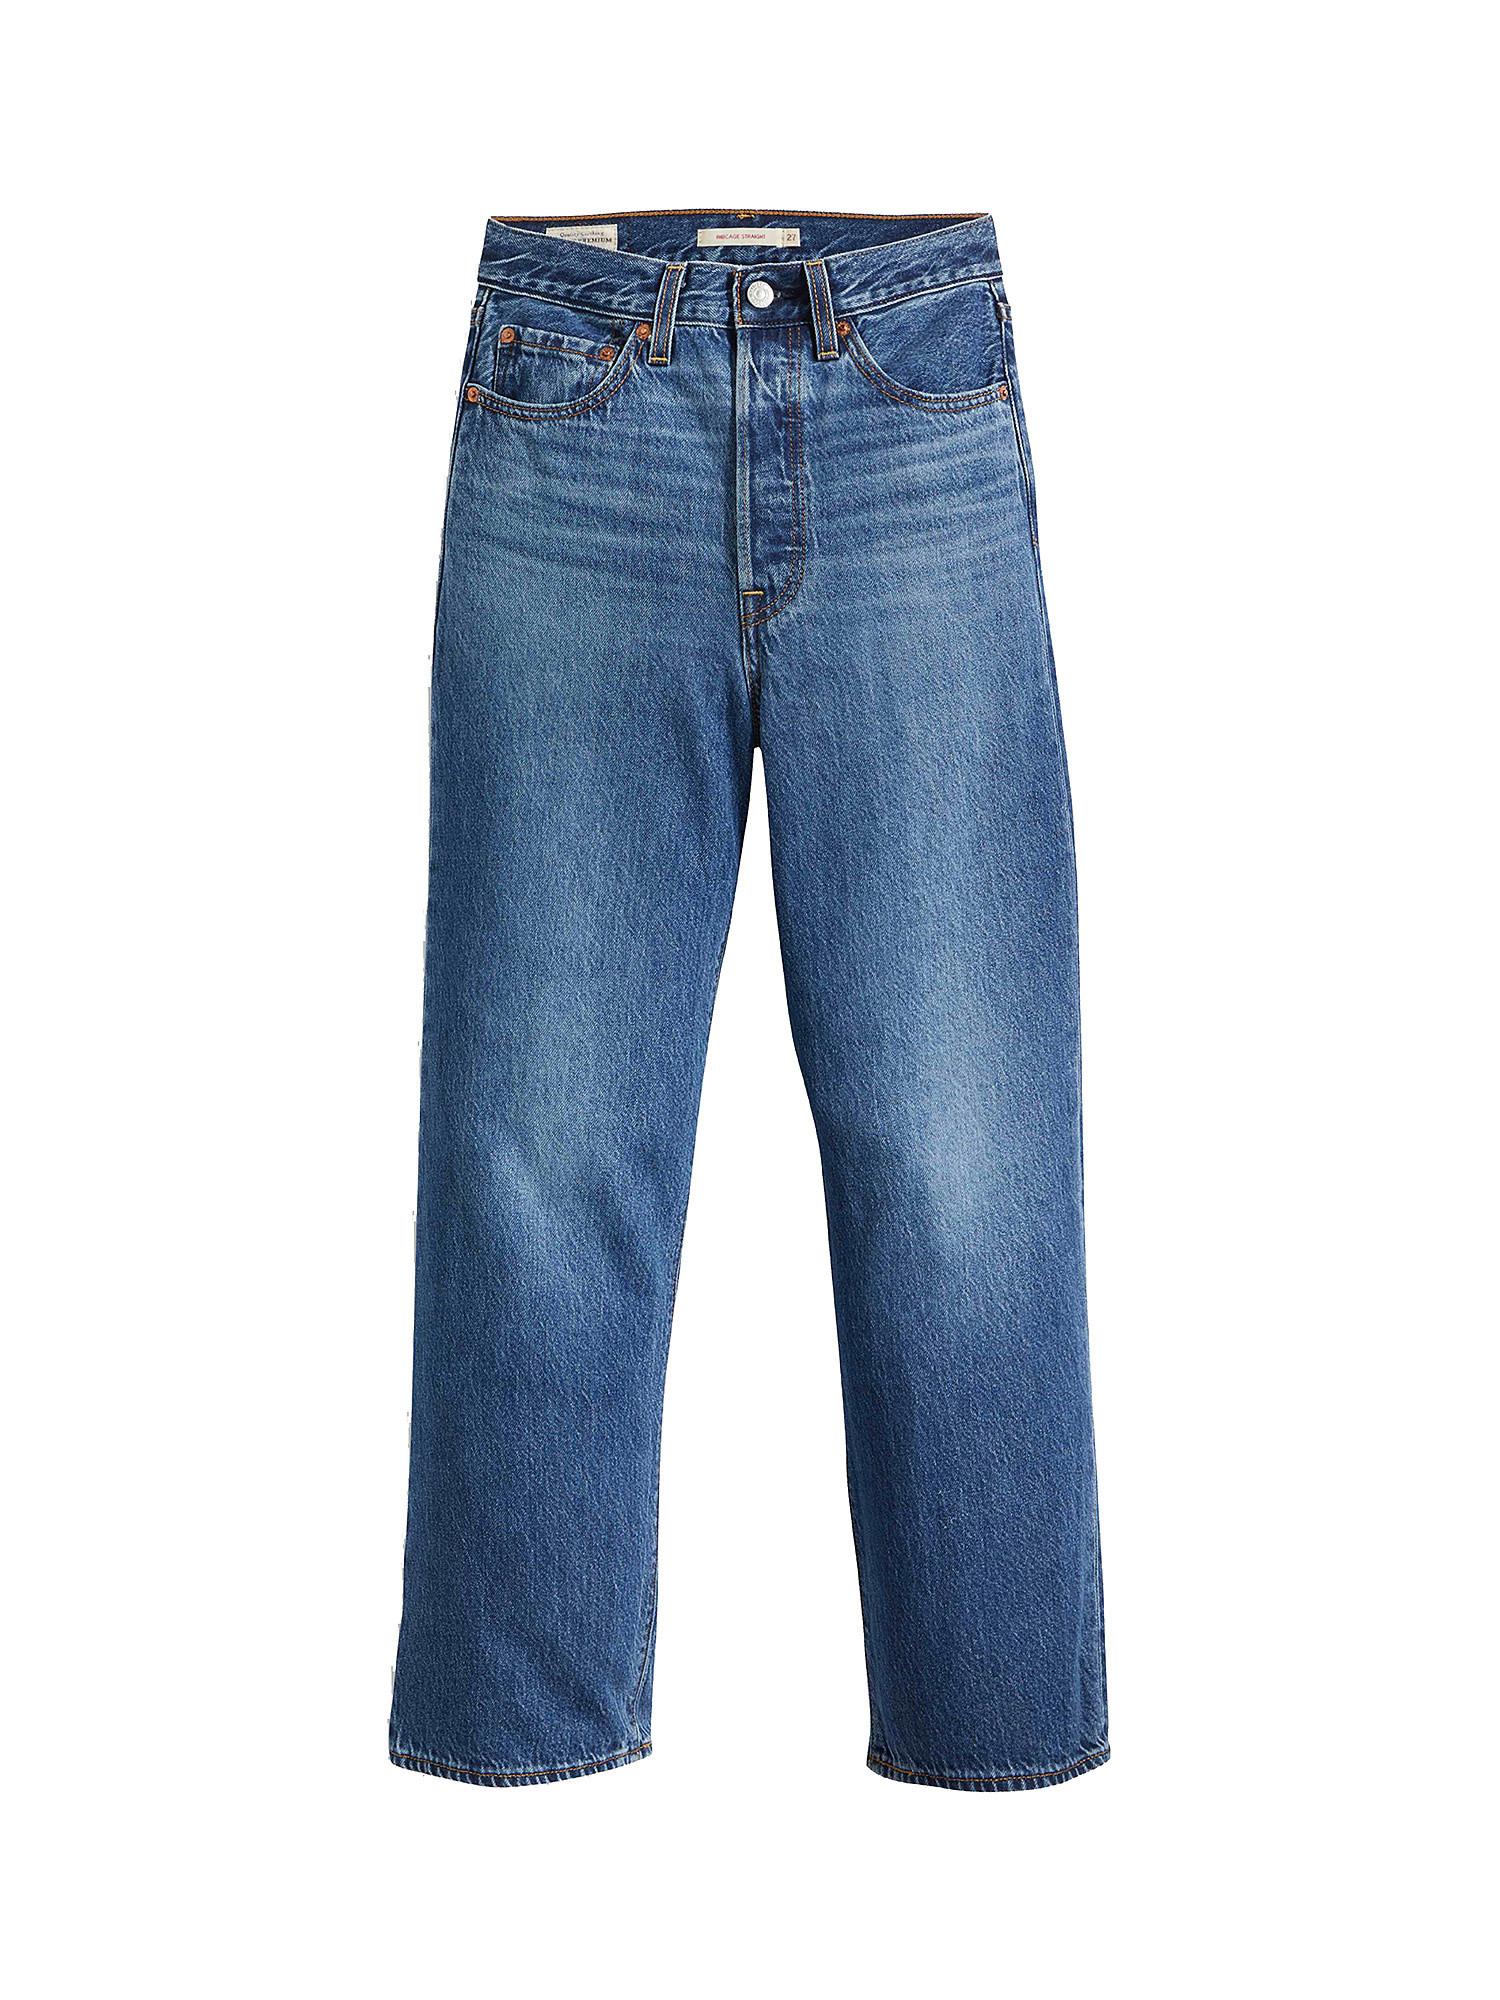 Jeans donna ribcage straight ankle, Denim, large image number 0